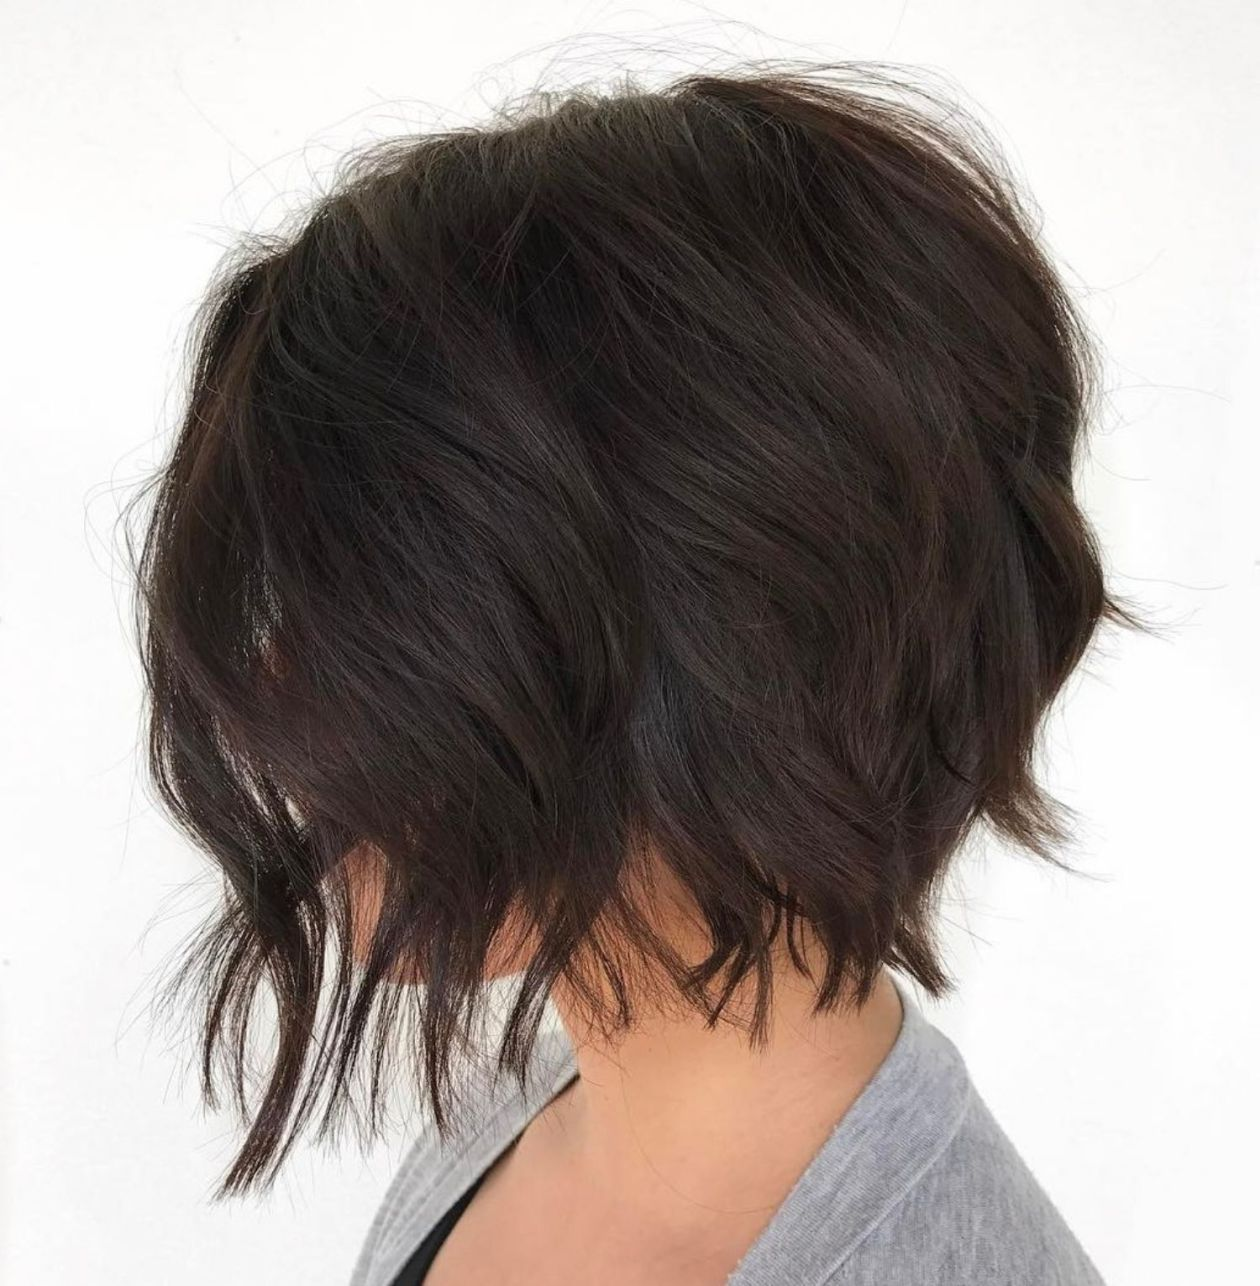 Choppy Brunette Bob Shag Frisuren Frisuren Frisuren Haarschnitte